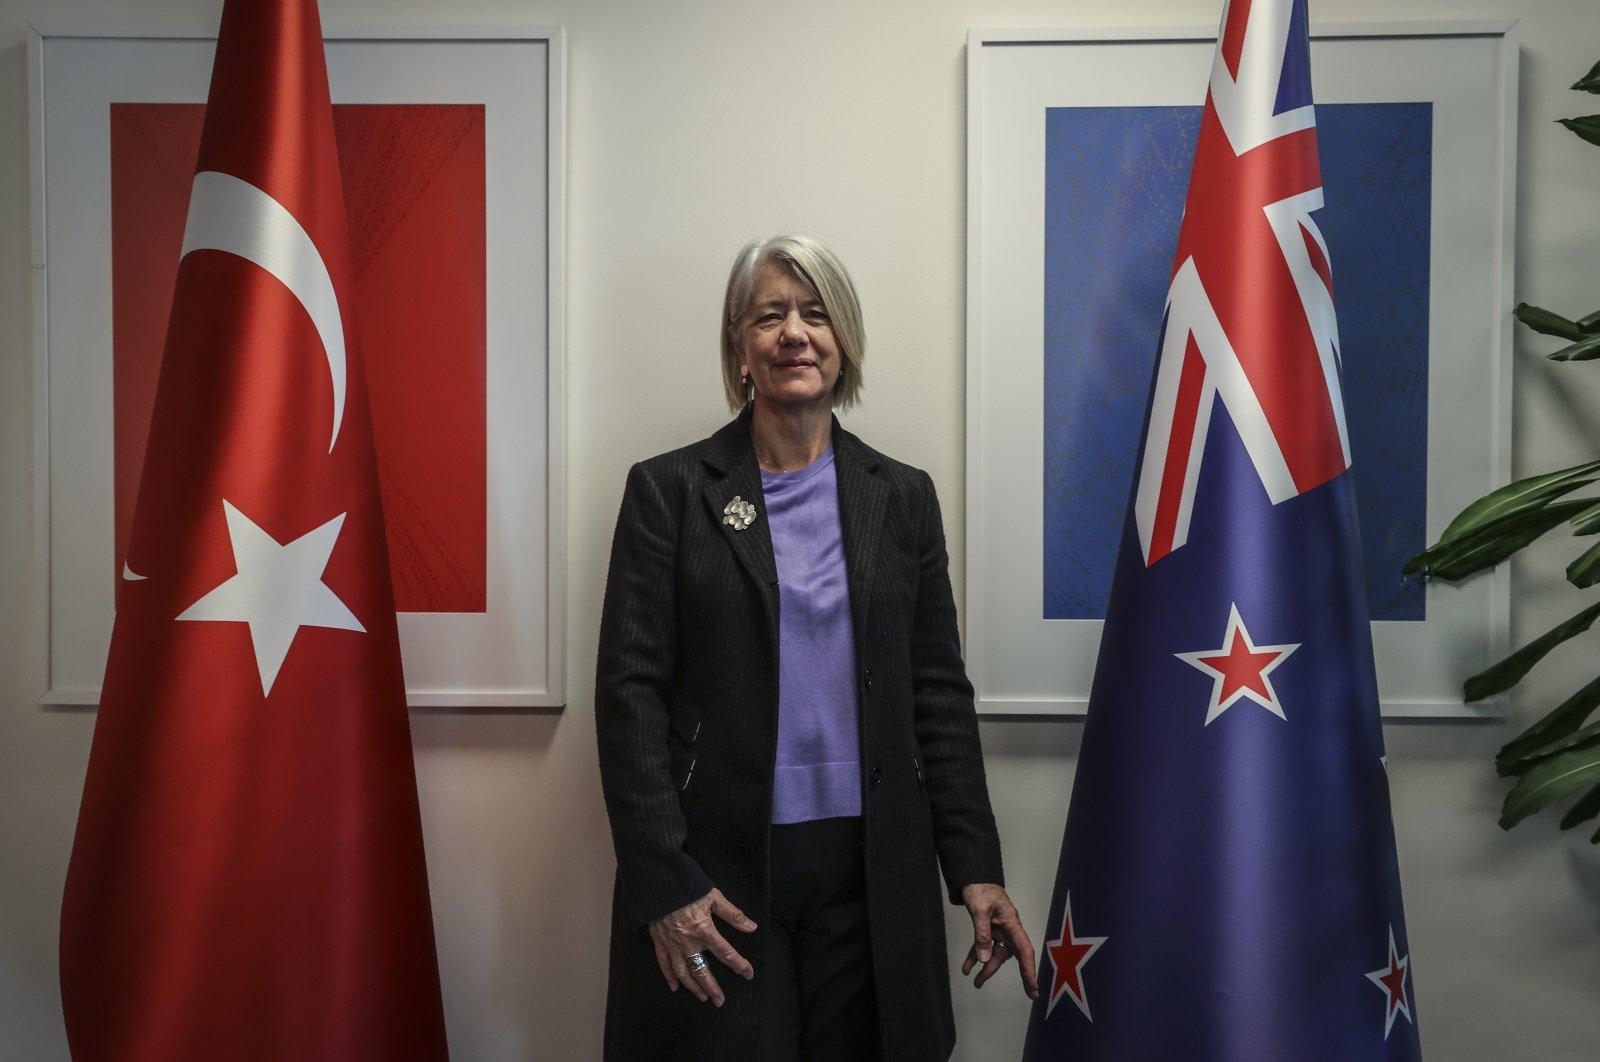 New Zealand's Ambassador to Turkey Wendy Hinton gives an interview to Anadolu Agency (AA),  Ankara, Turkey, Dec. 1, 2020. (AA Photo)